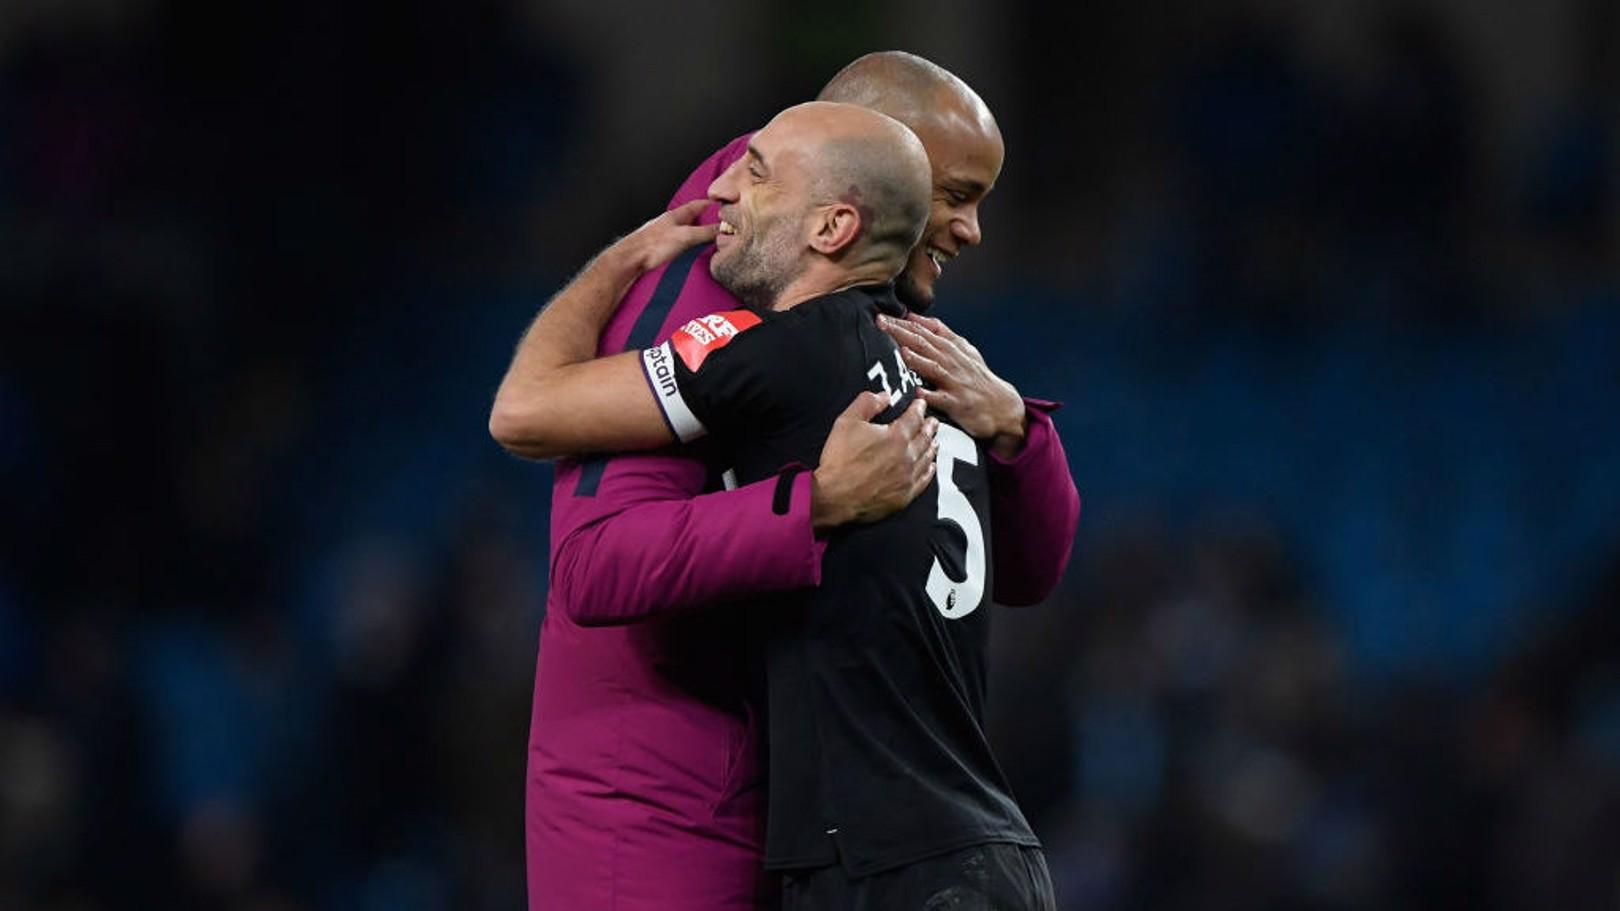 RETURN: Pablo Zabaleta spoke after returning to the Etihad when West Ham faced City.